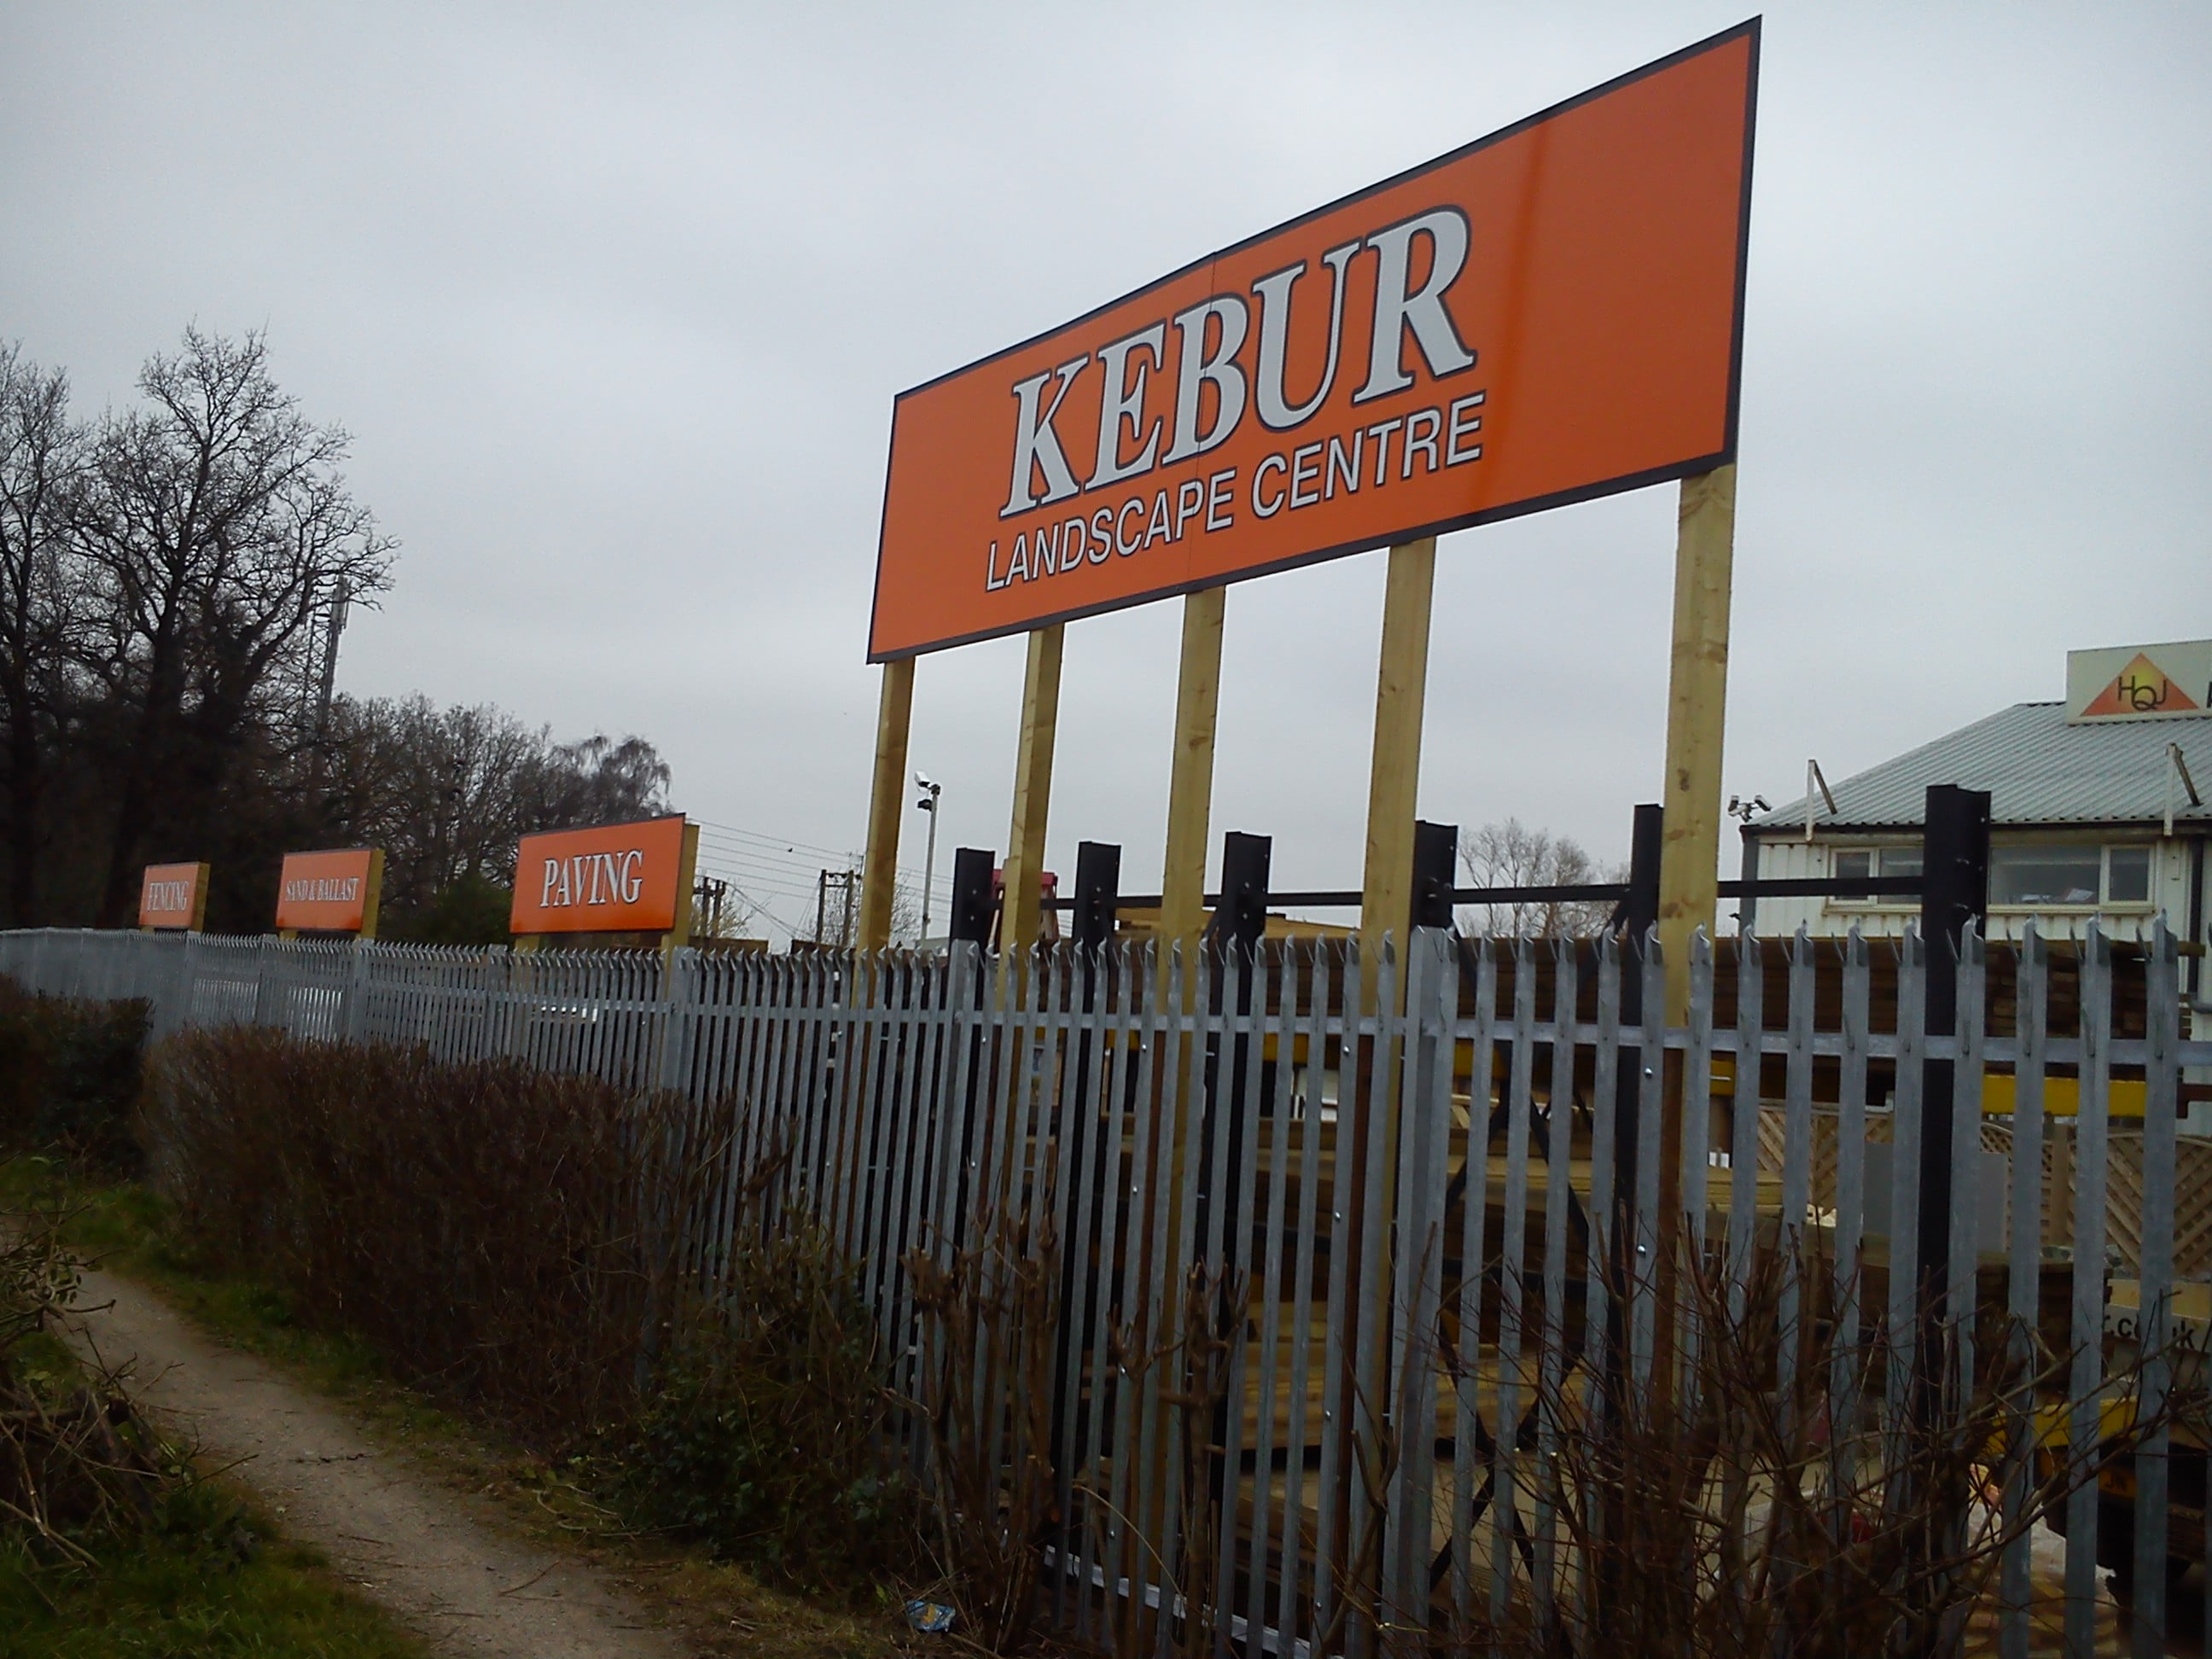 New Kebur Signage